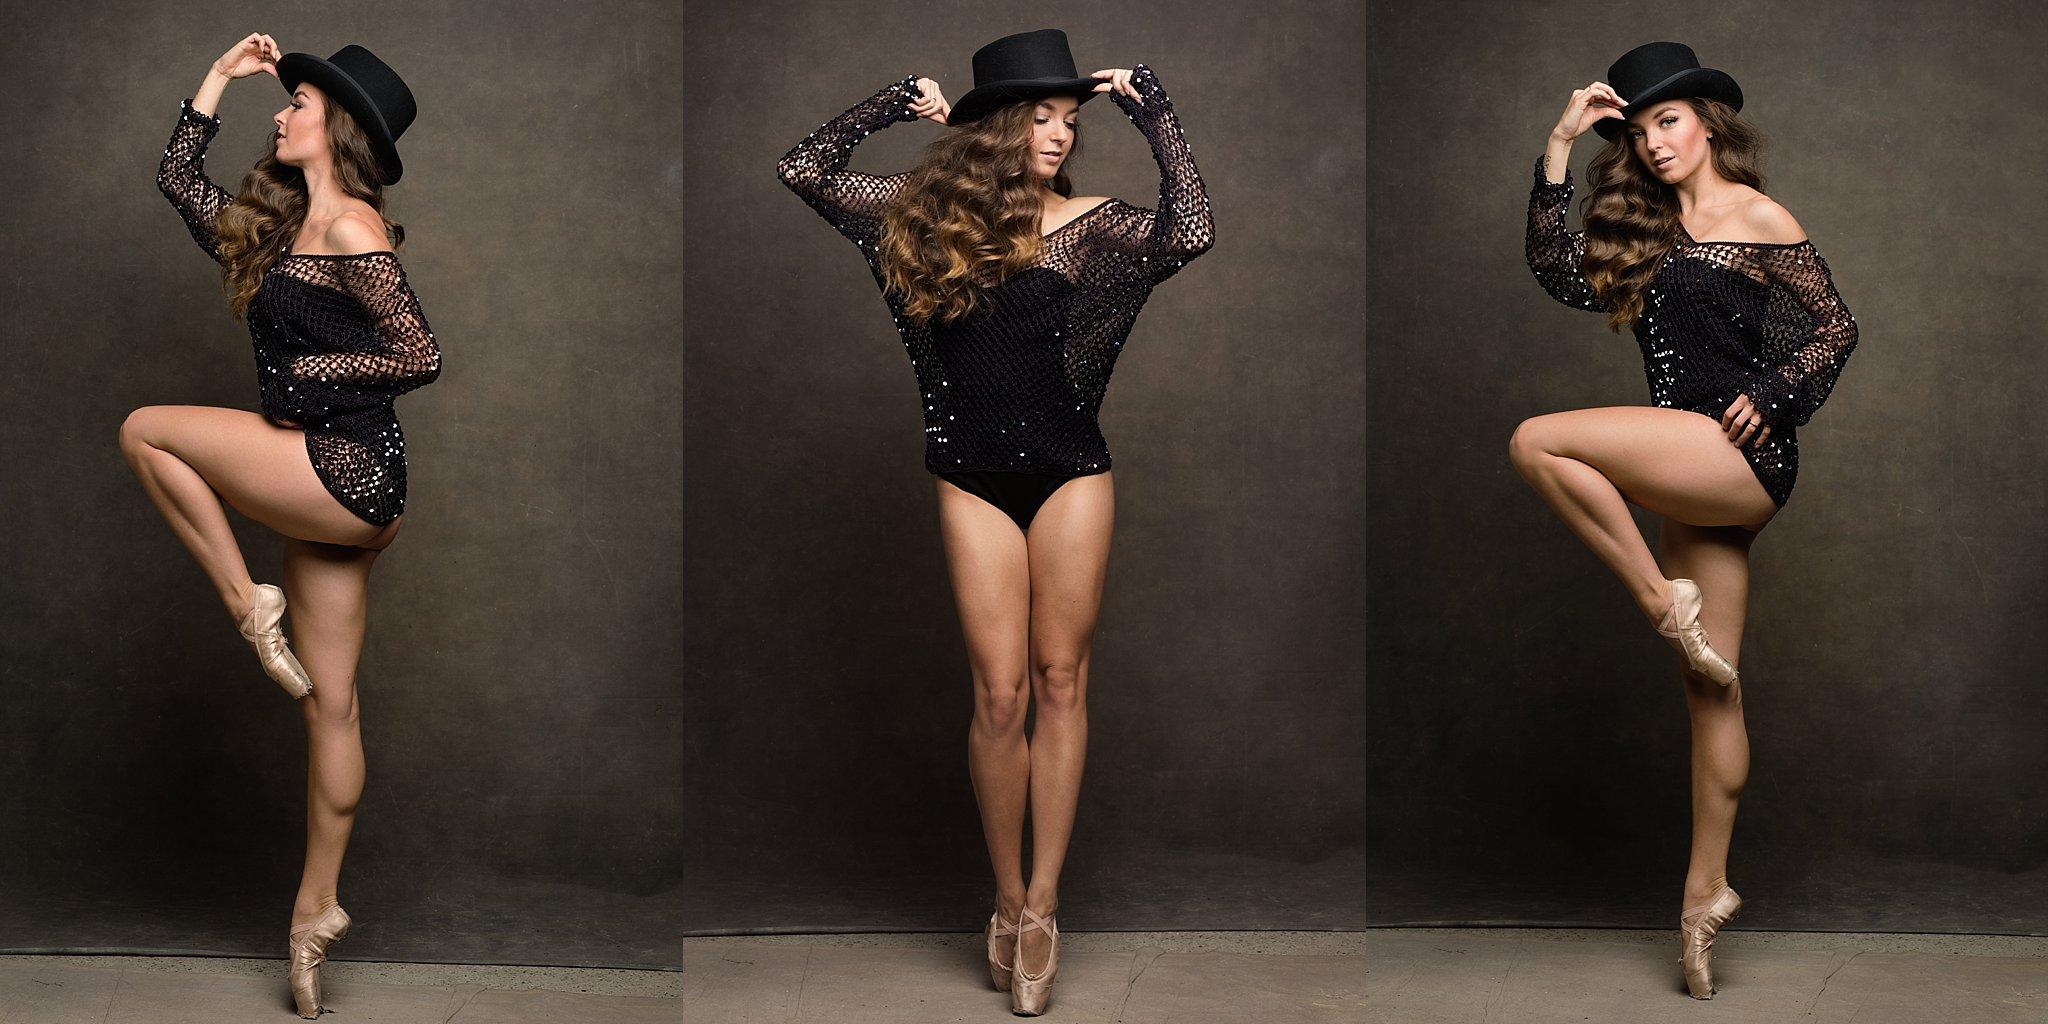 dance infusion - jazz dance - lyrical dancer - Kayla mutterer - ballerina - on pointe